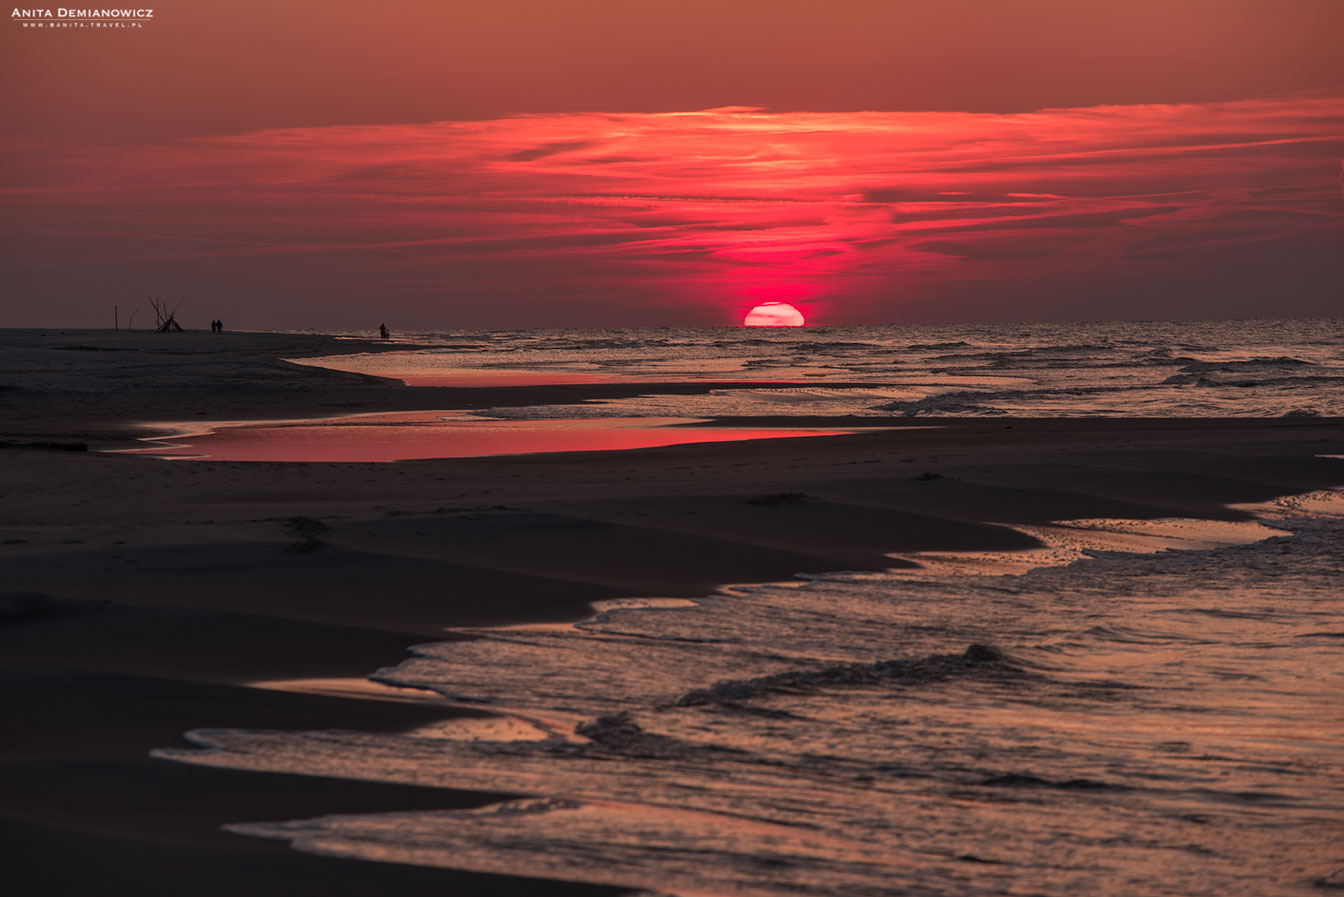 Plaża wBiałogórze